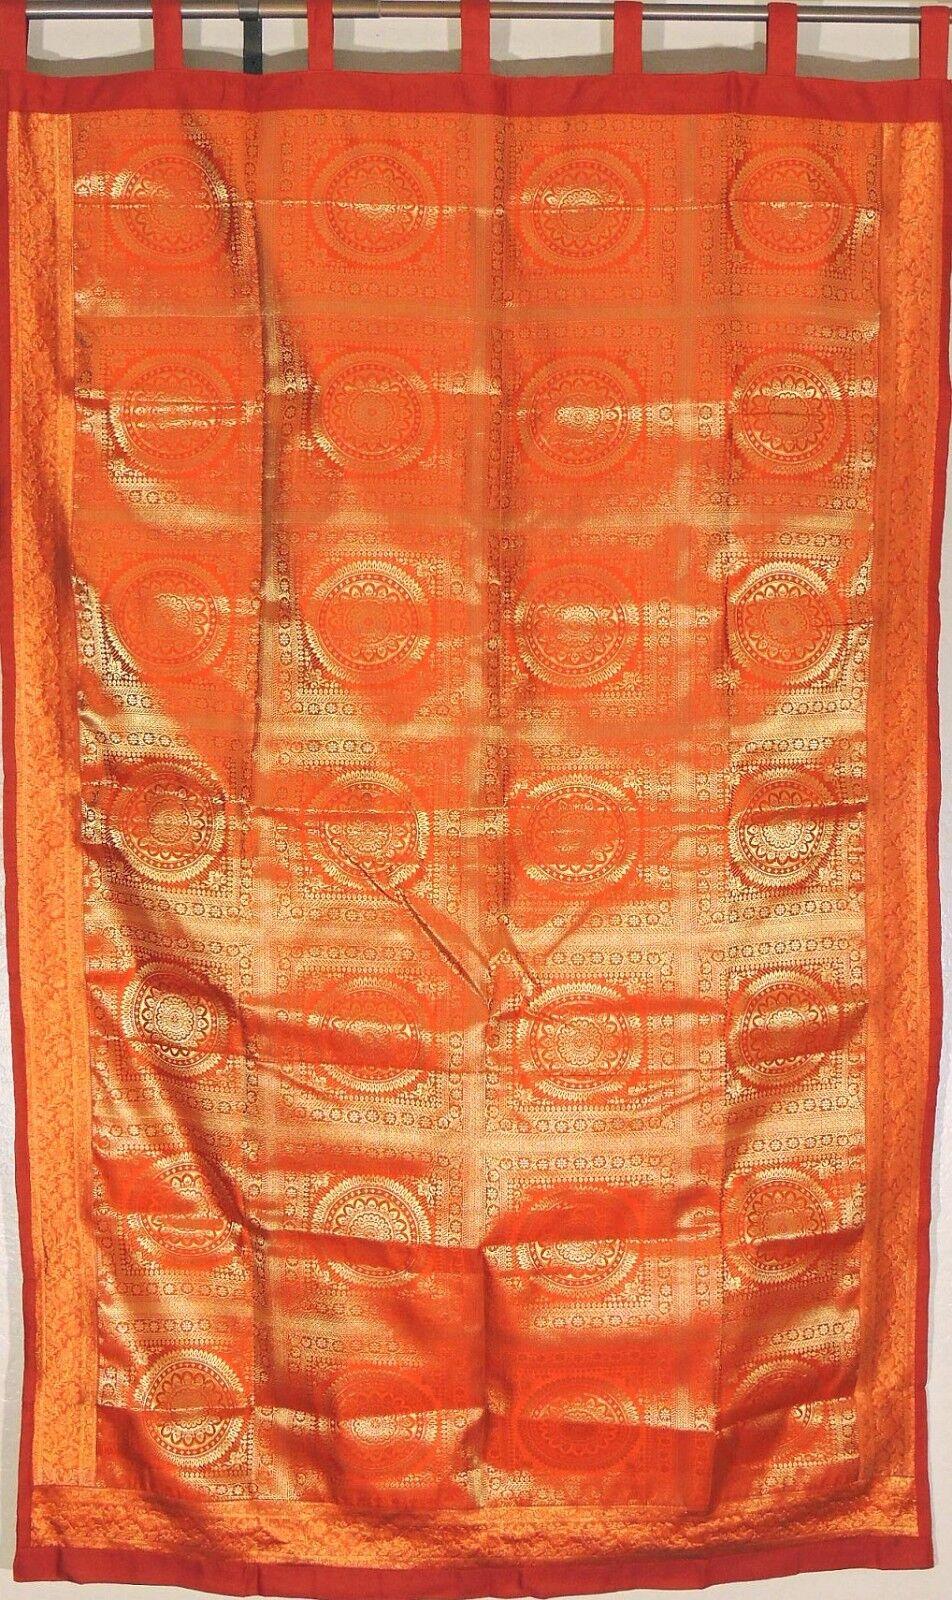 Cortina naranja Mandala-Designer Elegante Brillante Brocade Ventana Panel 82